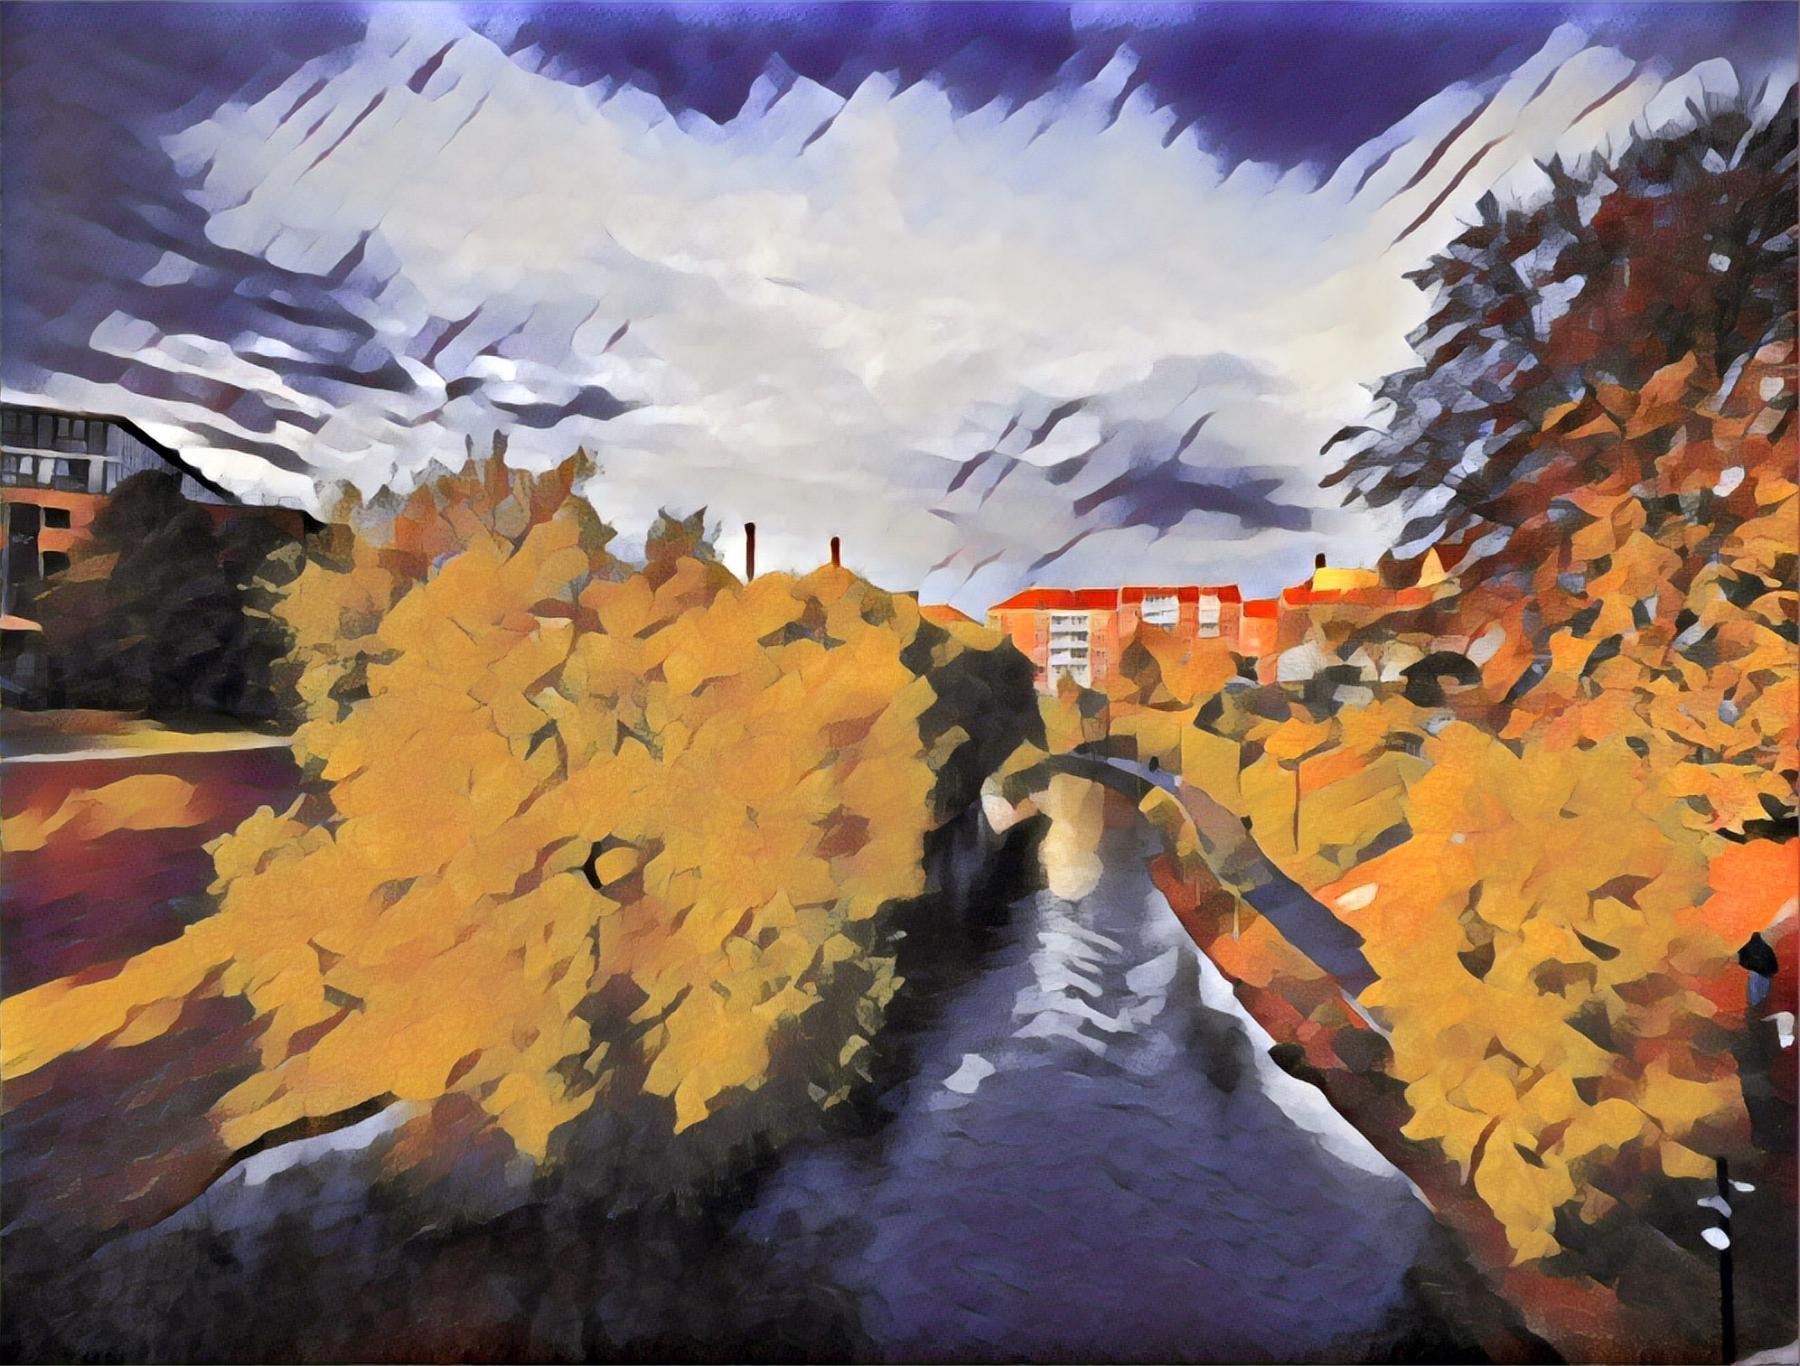 Akerselva River in Grünerløkka, Oslo